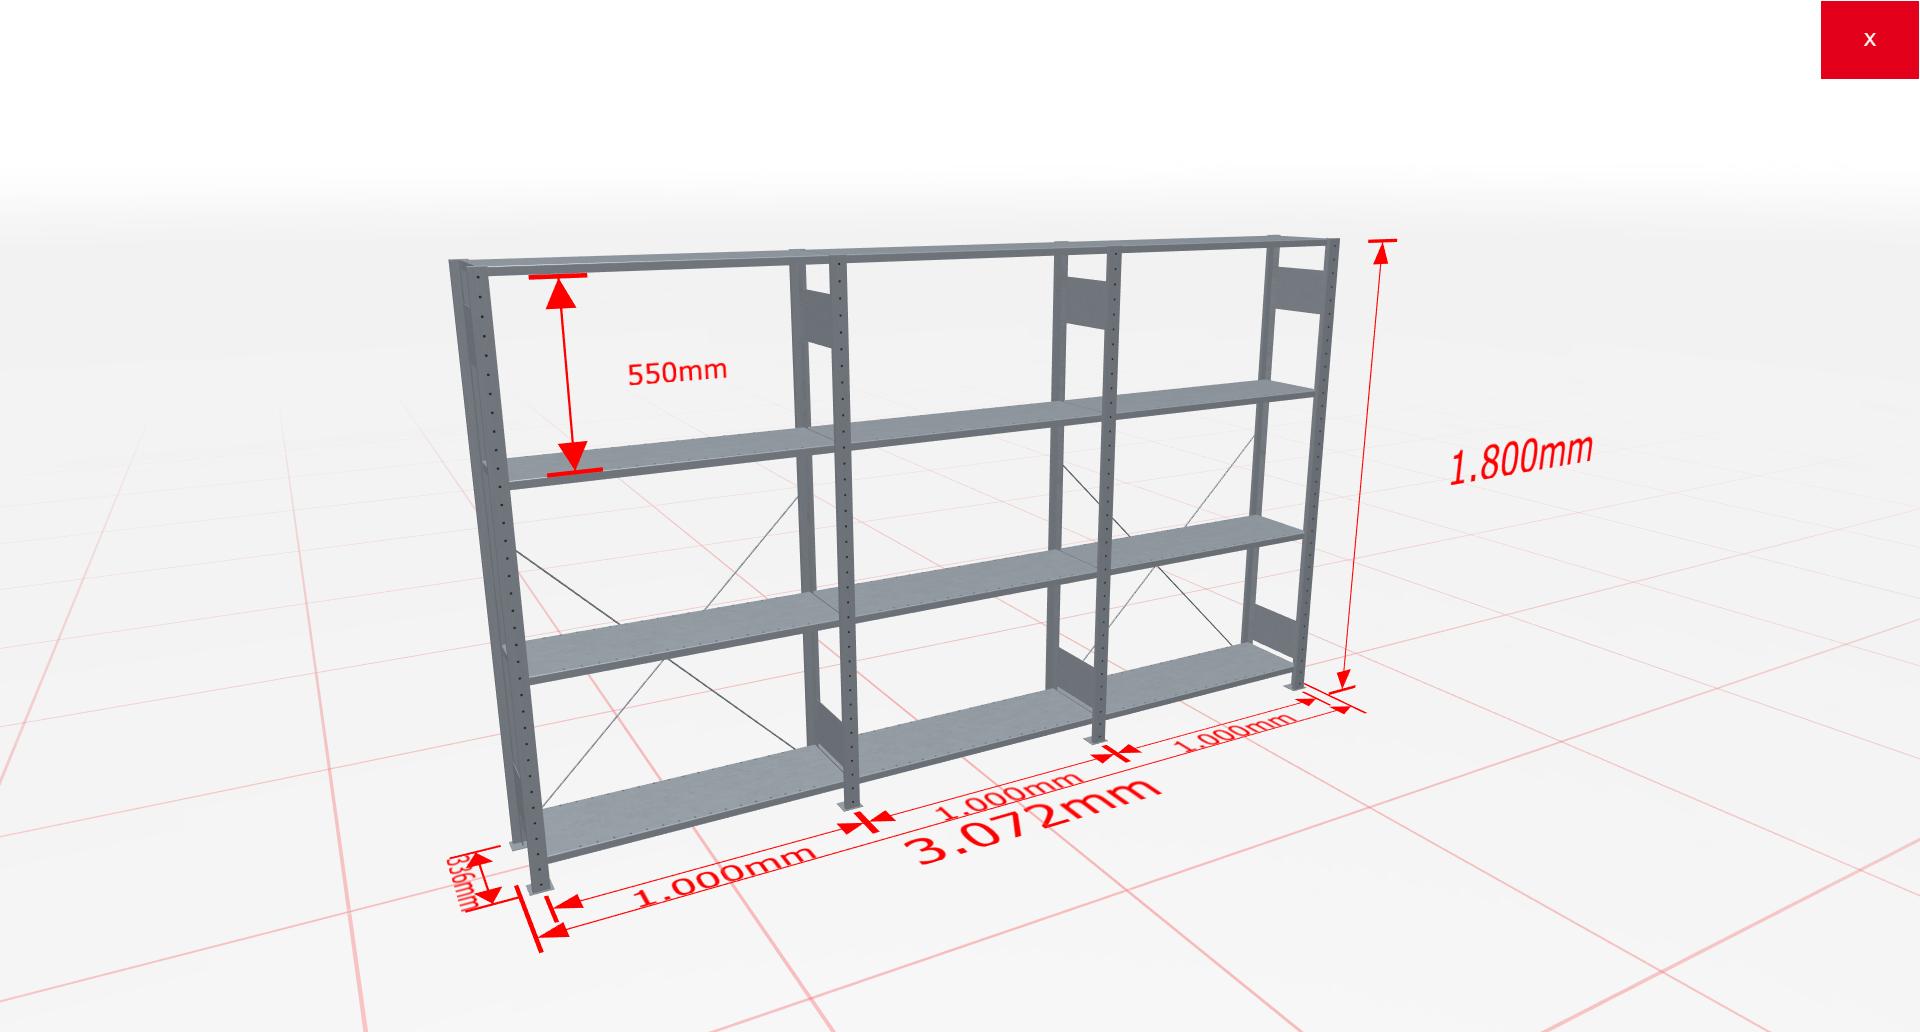 Fachbodenregal Komplettregal 1800x3072x300 mm (HxBxT) SCHULTE Lagertechnik verzinkt 4 Ebenen  150 kg je Boden